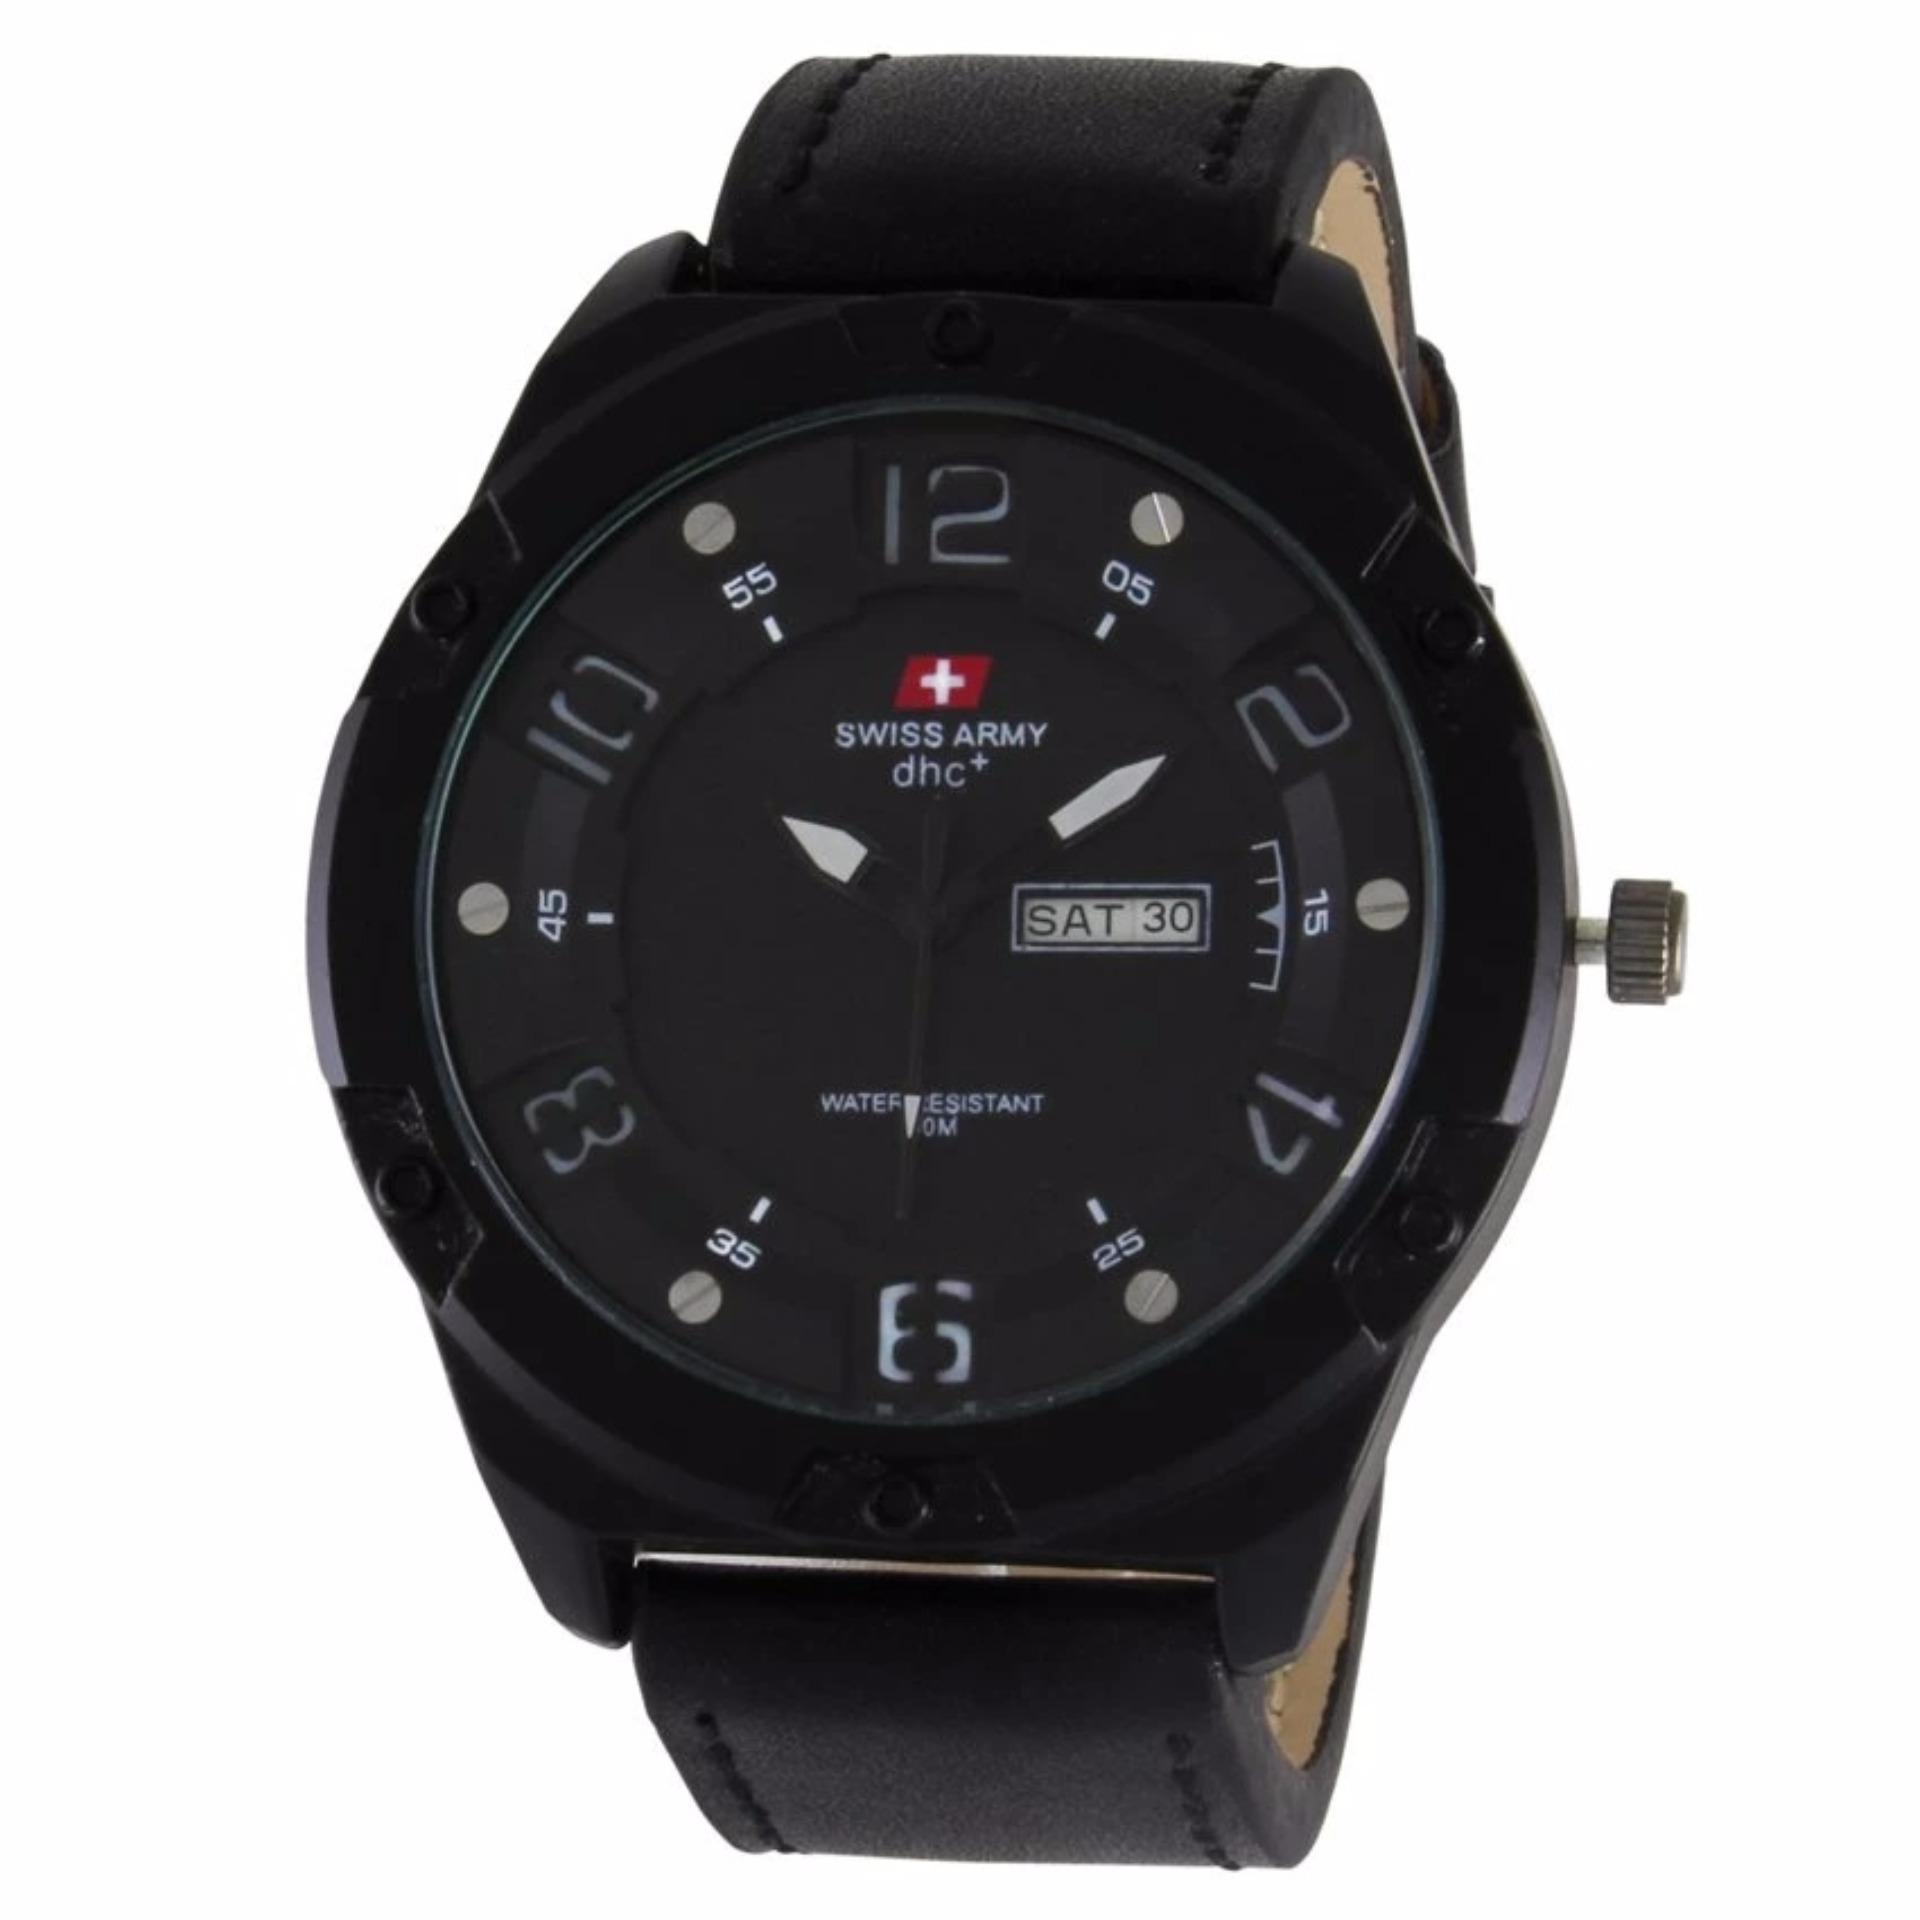 ... Swiss Army Sa205 Jam Tangan Kasual Pria Leather Strap Chronograph Guess U0701l1 Women Dressy Jewelry Inspired